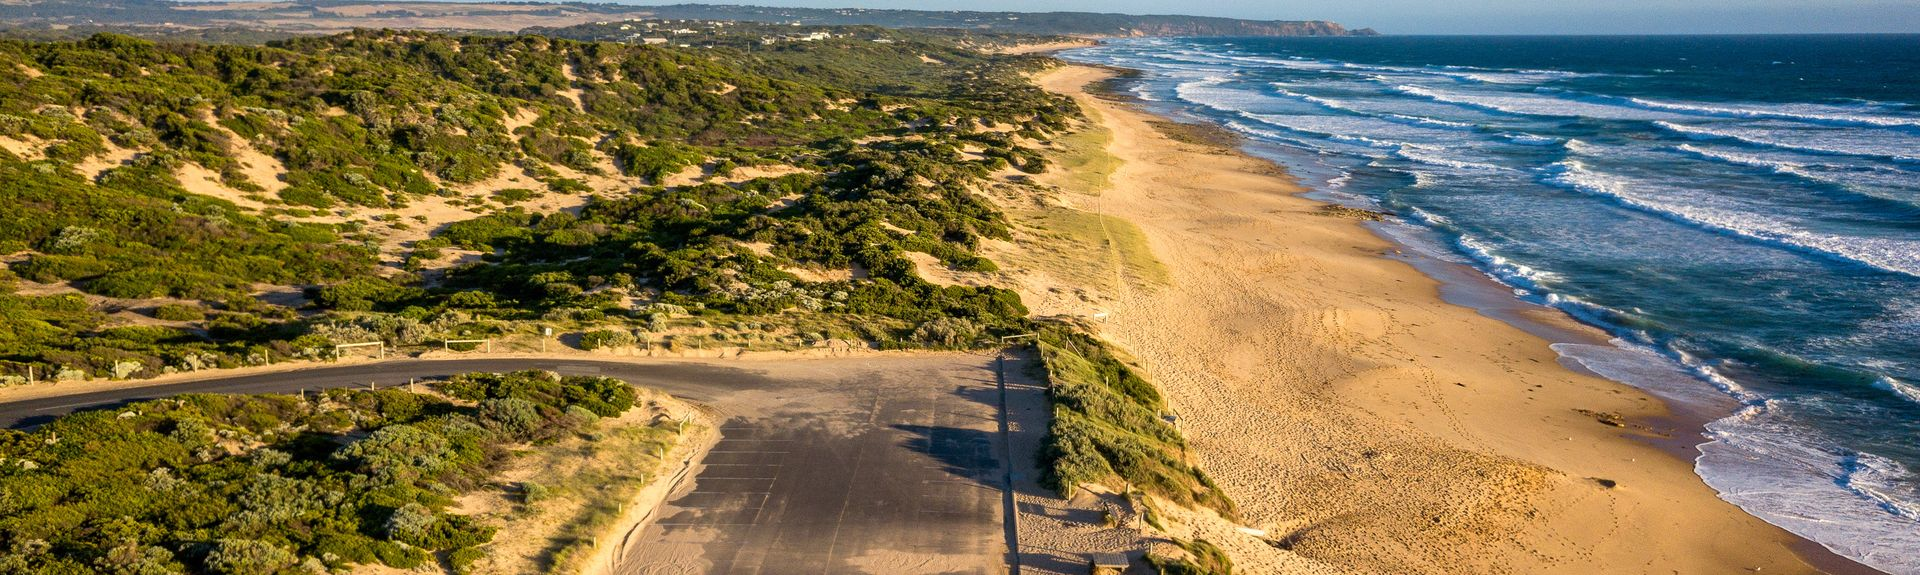 Saint Andrews Beach VIC, Australia